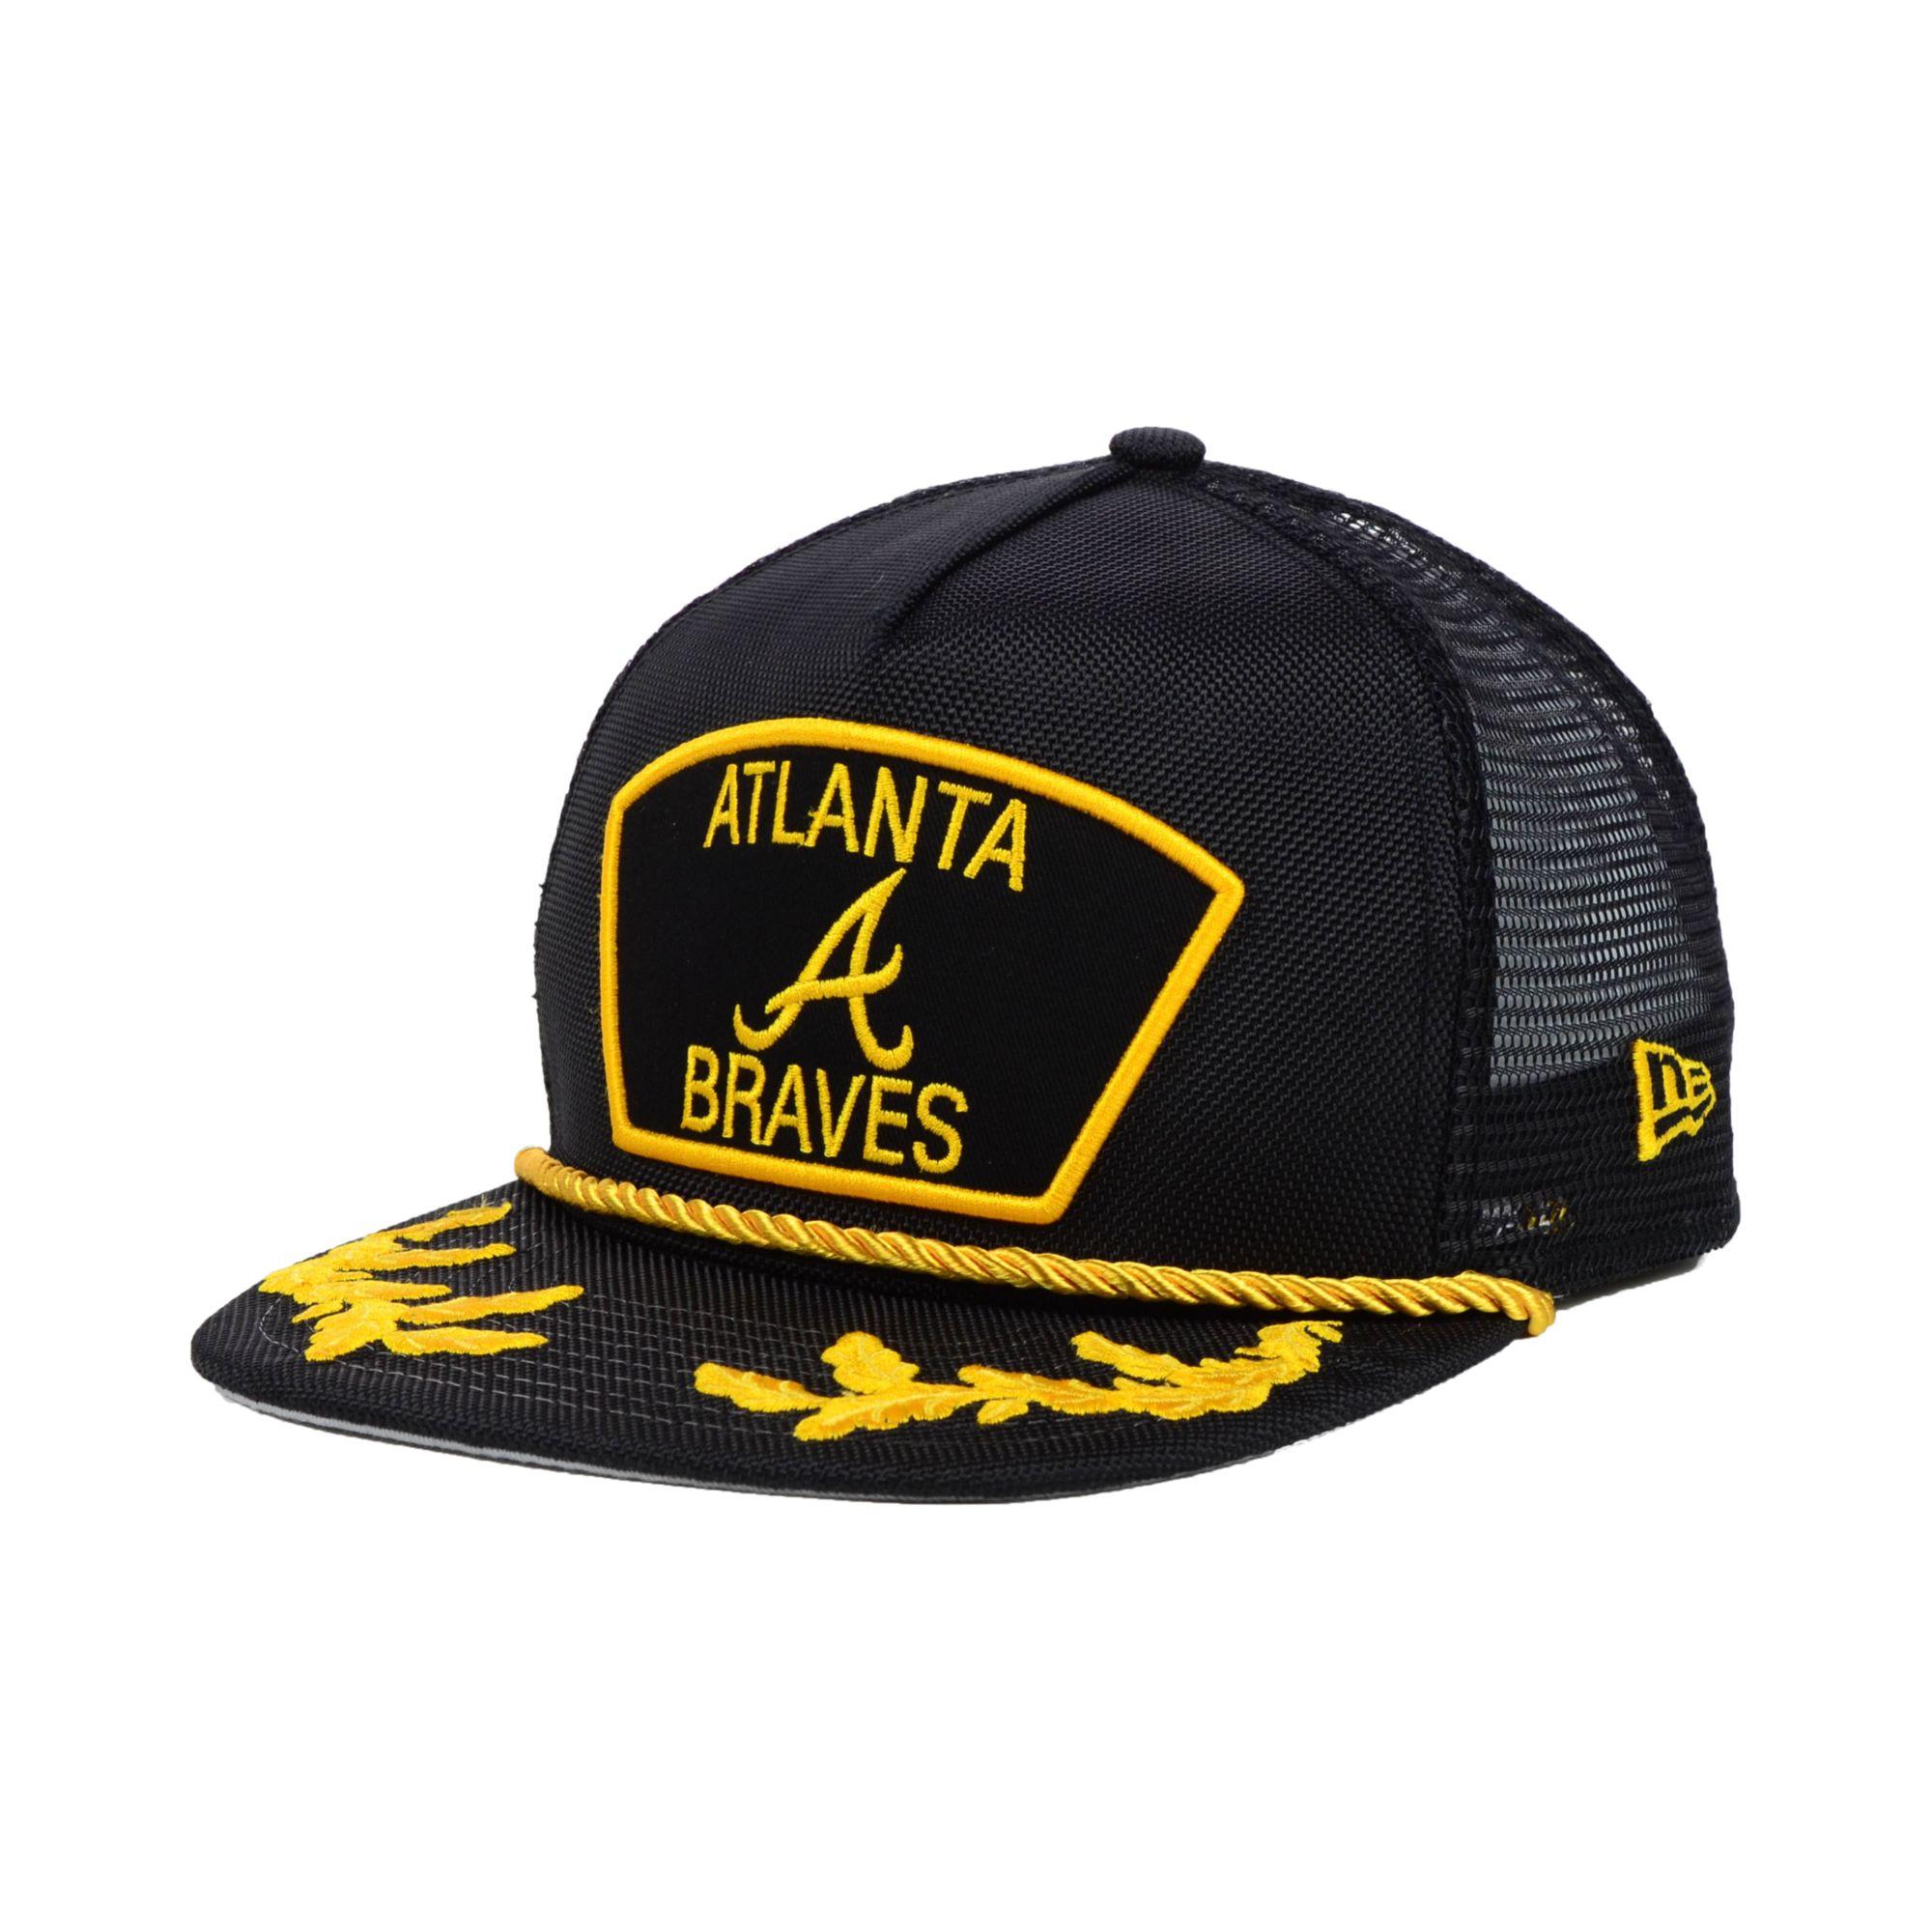 hot sale online a3464 8edc9 ... discount lyst ktz atlanta braves mlb 9fifty snapback cap in black for  men 3d113 27b23 ...